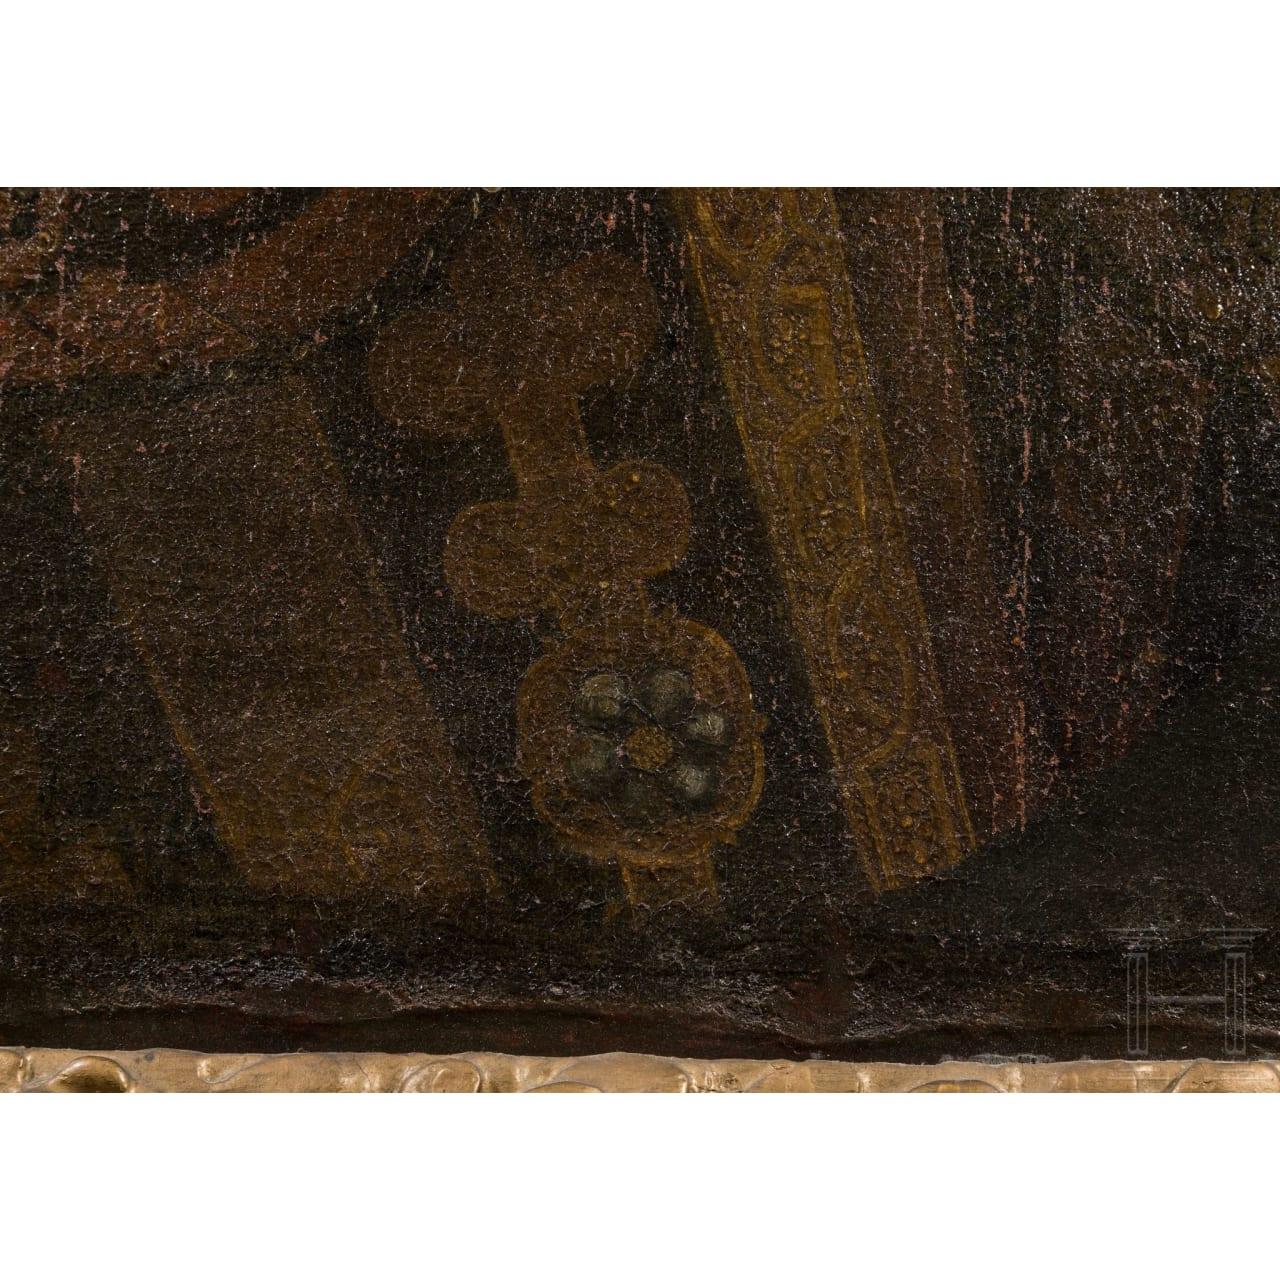 August the Younger of Braunschweig-Wolfenbüttel – a portrait in armour, circa 1650